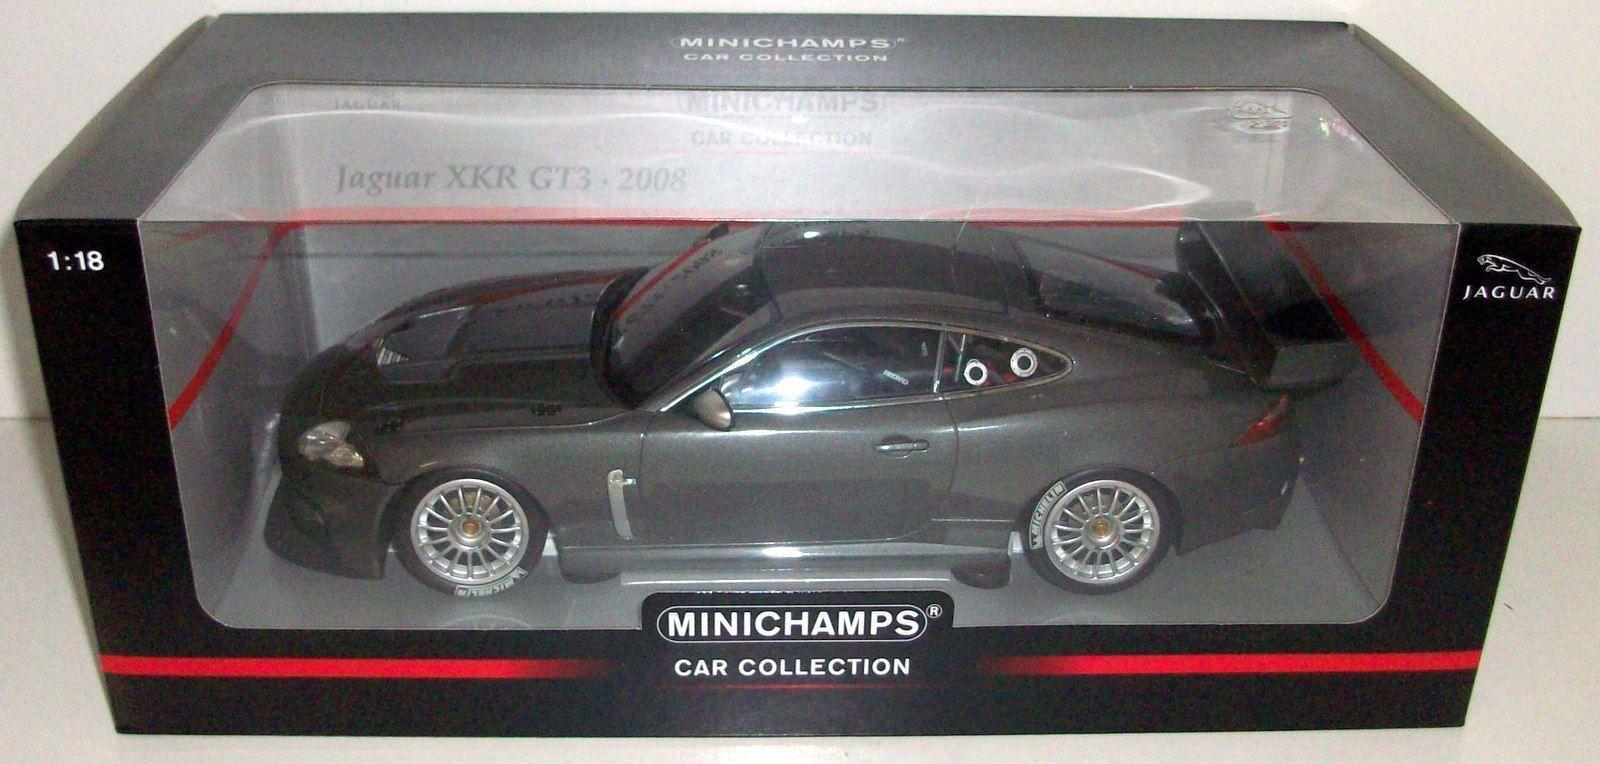 MINICHAMPS 1 18 - 150 081390 JAGUAR XKR GT3 - GREY METALLIC 2008 - REDUCED